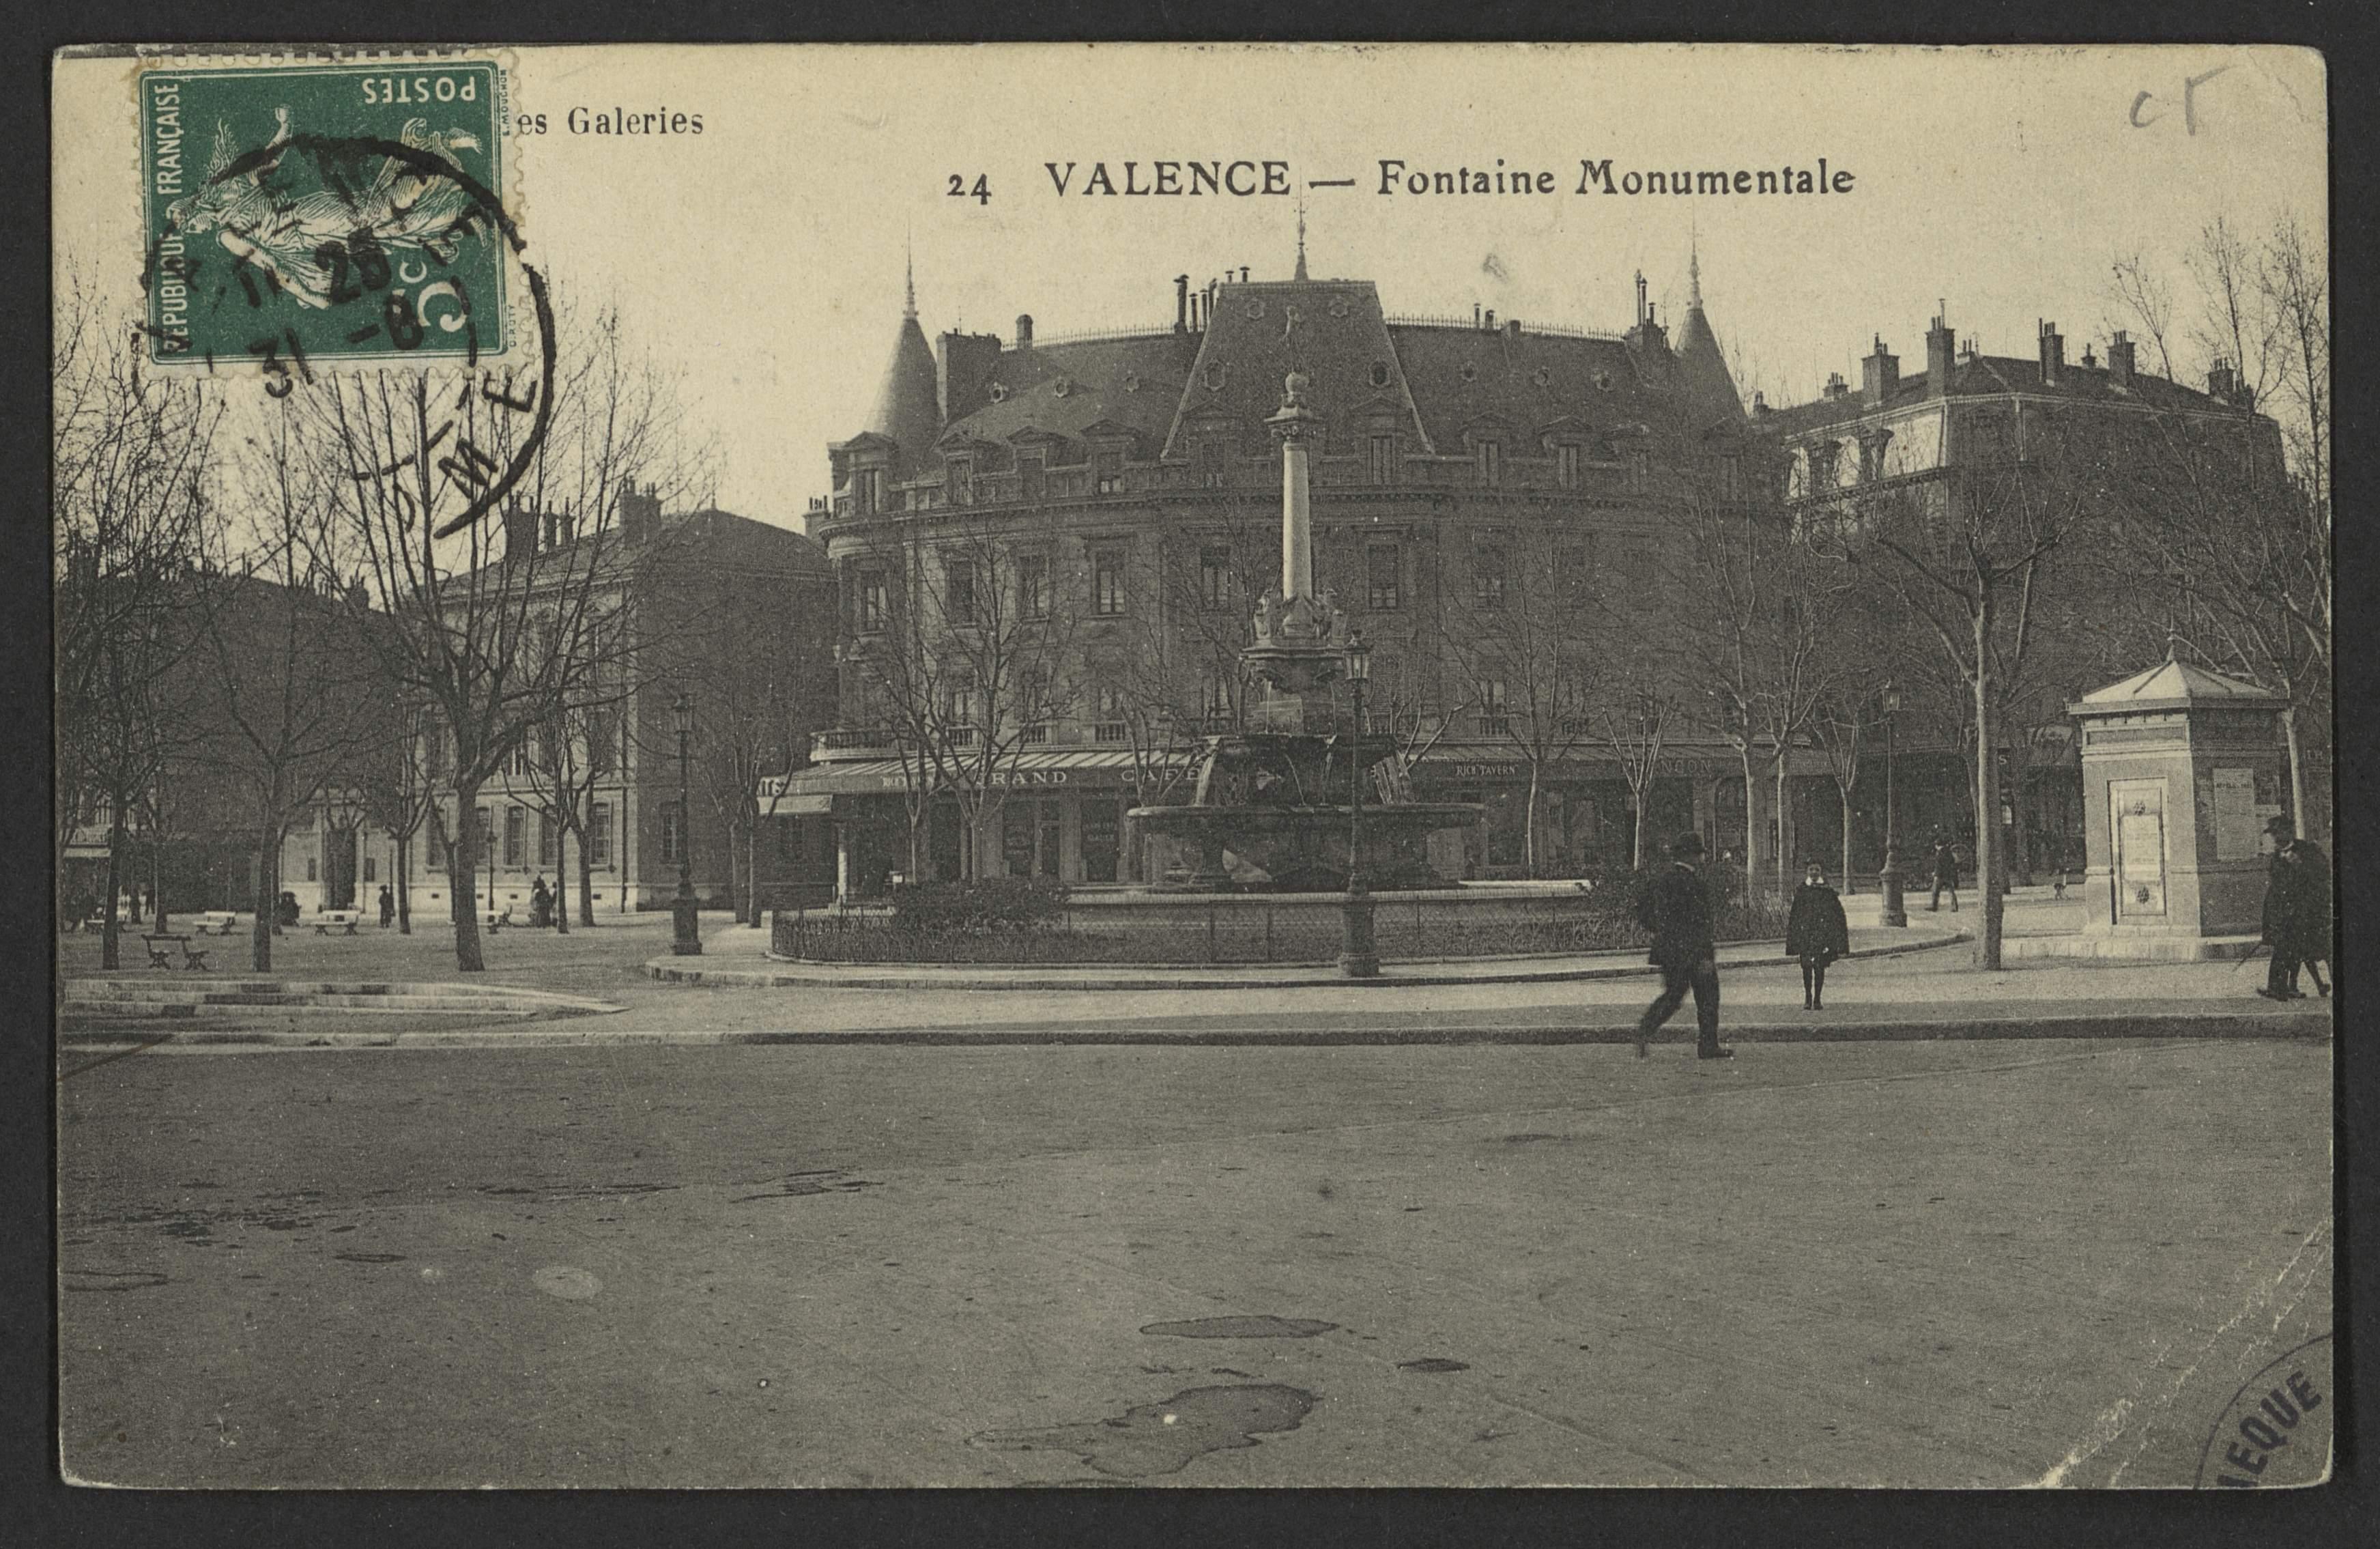 Valence - Fontaine Monumentale